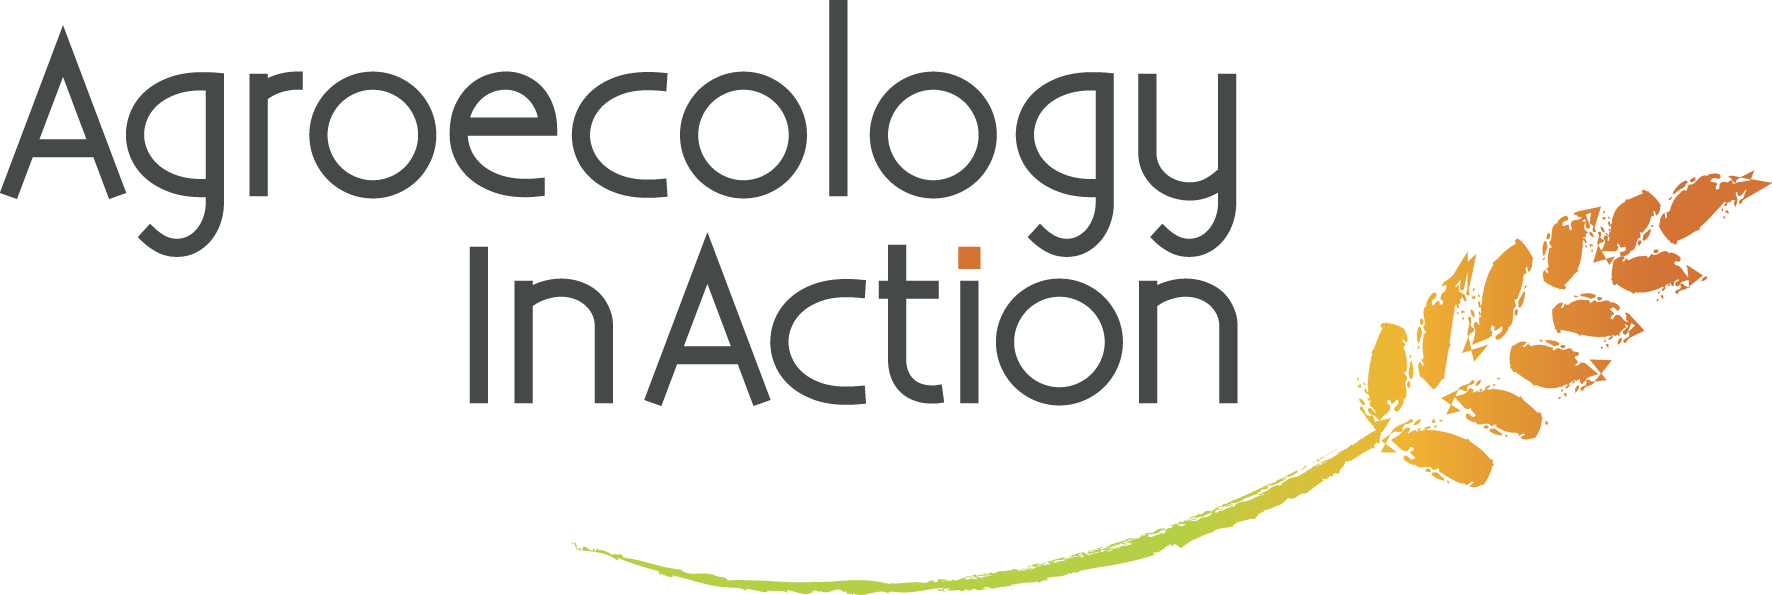 logo-agroecology-action